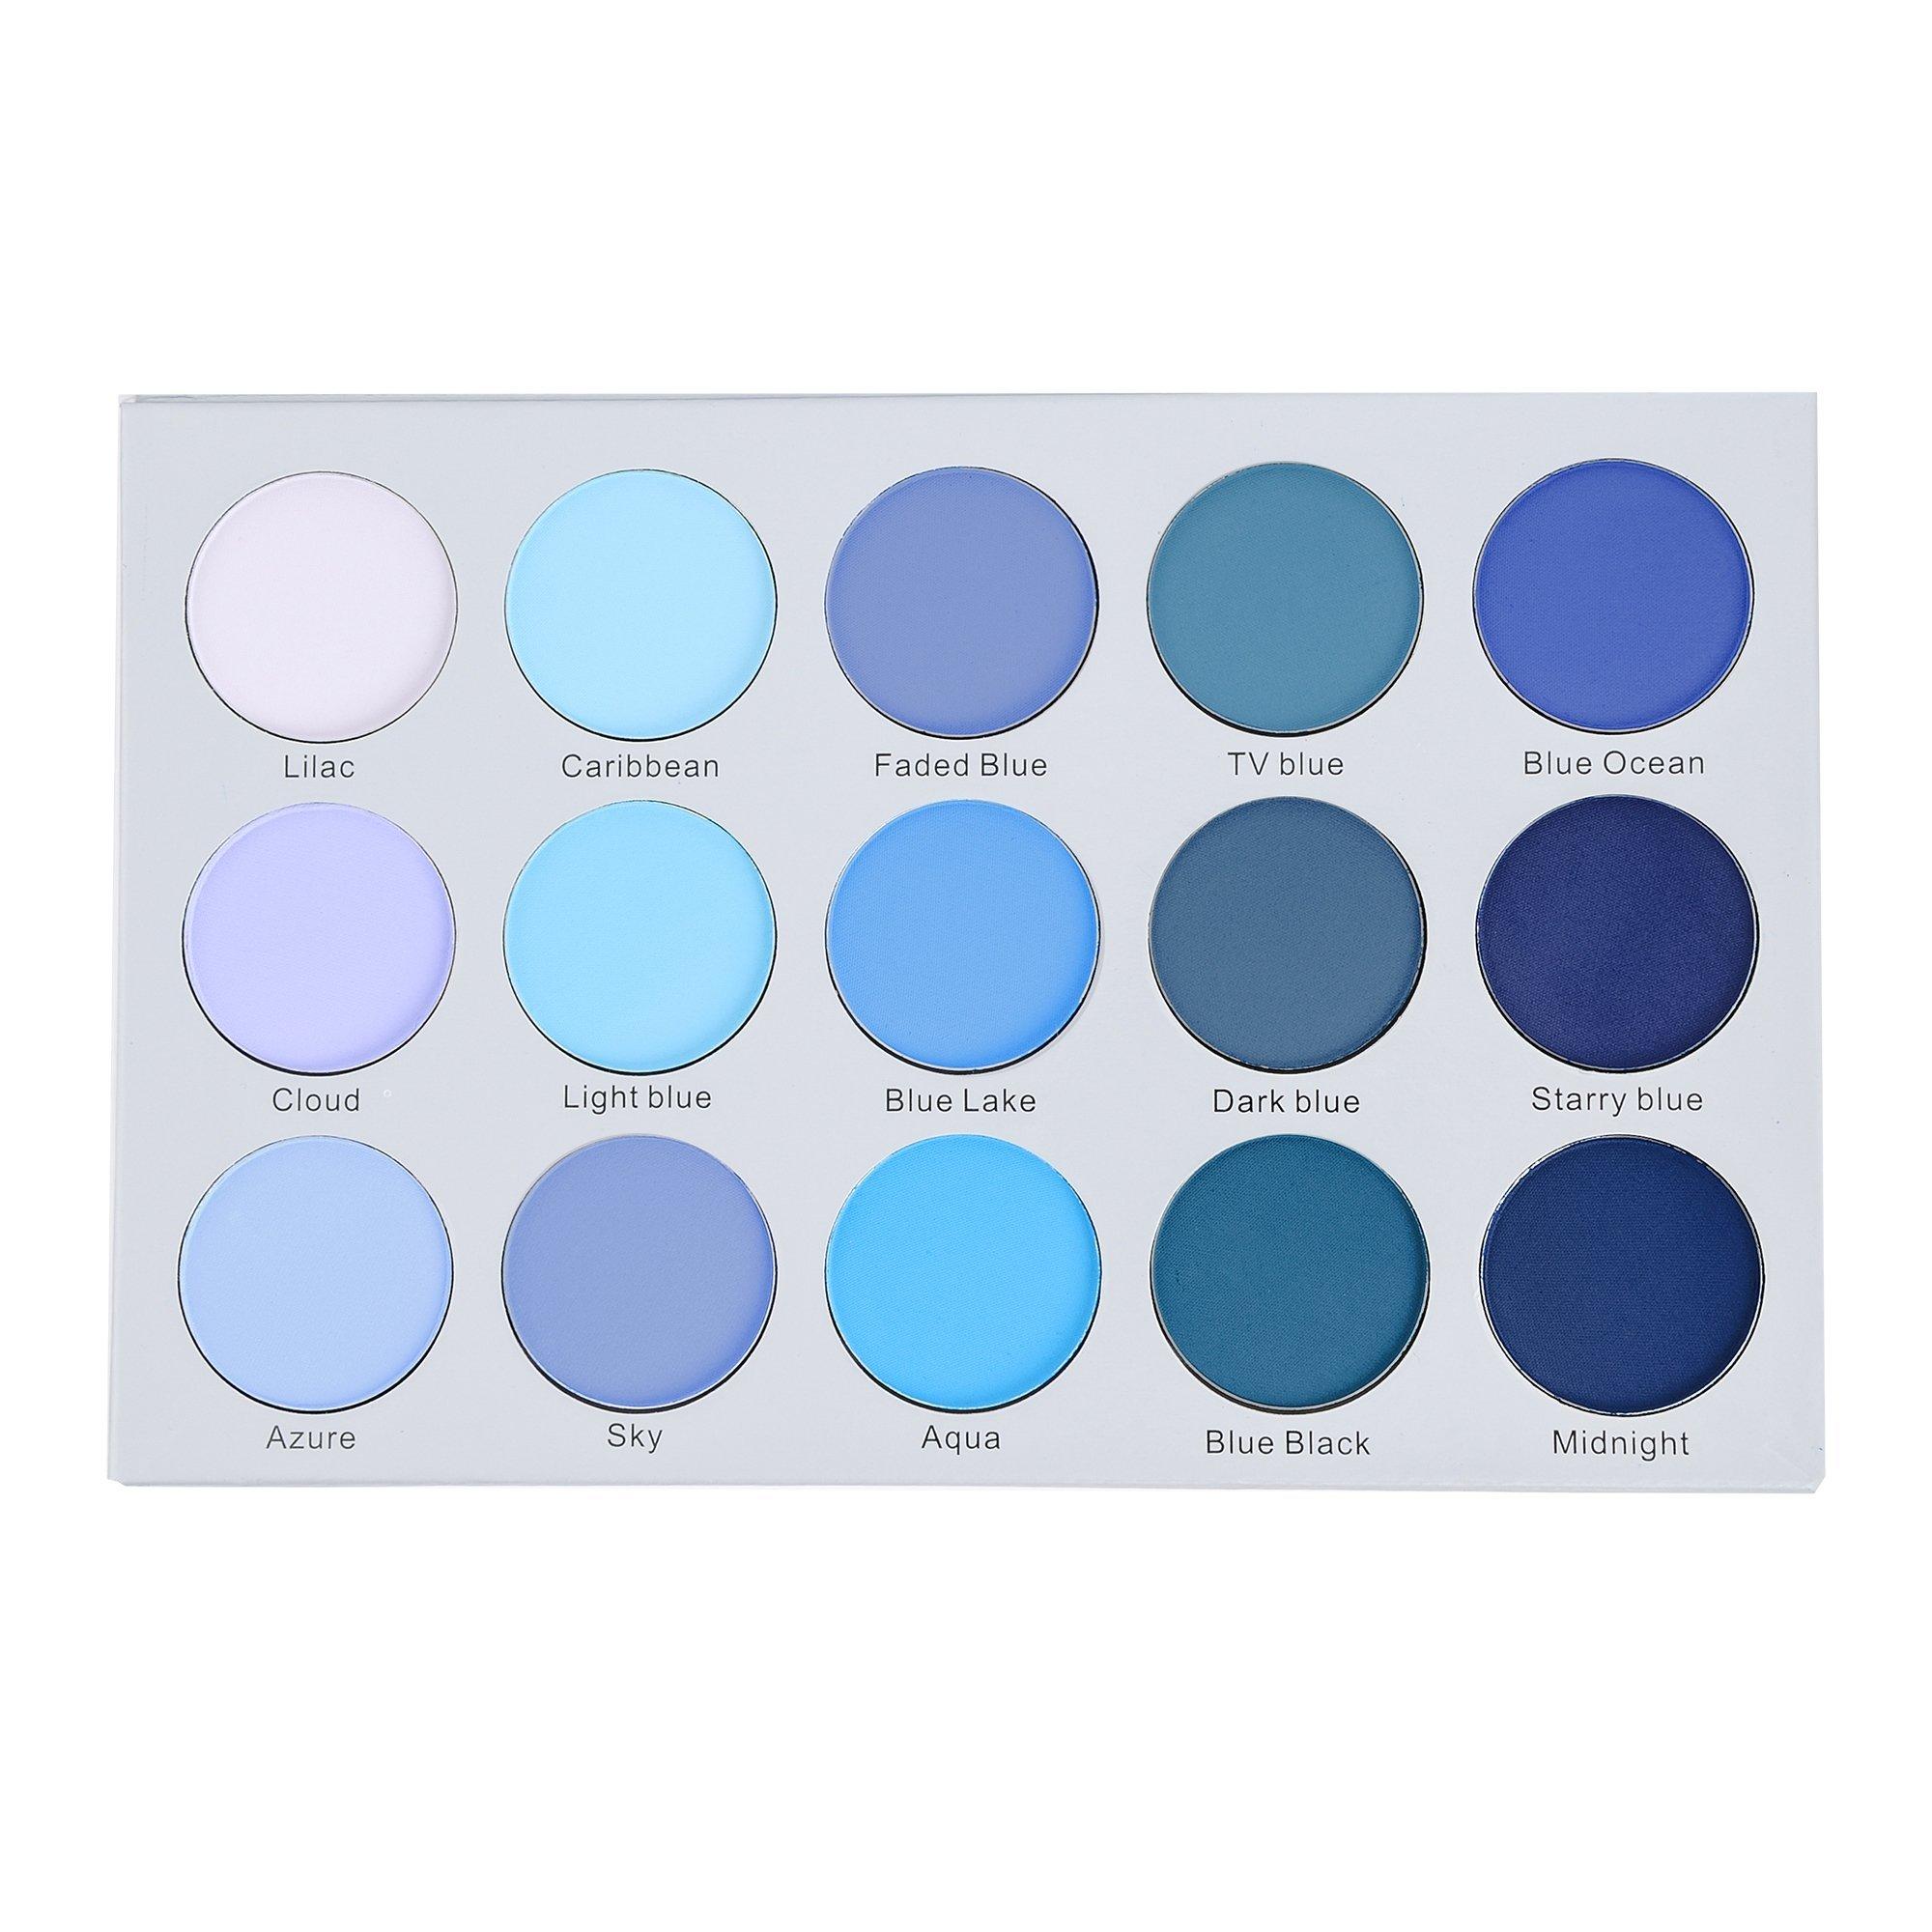 38919df5dde Amazon.com: Kara Beauty ES22 15 COLOR SMOKY BLUE EYESHADOW: Beauty